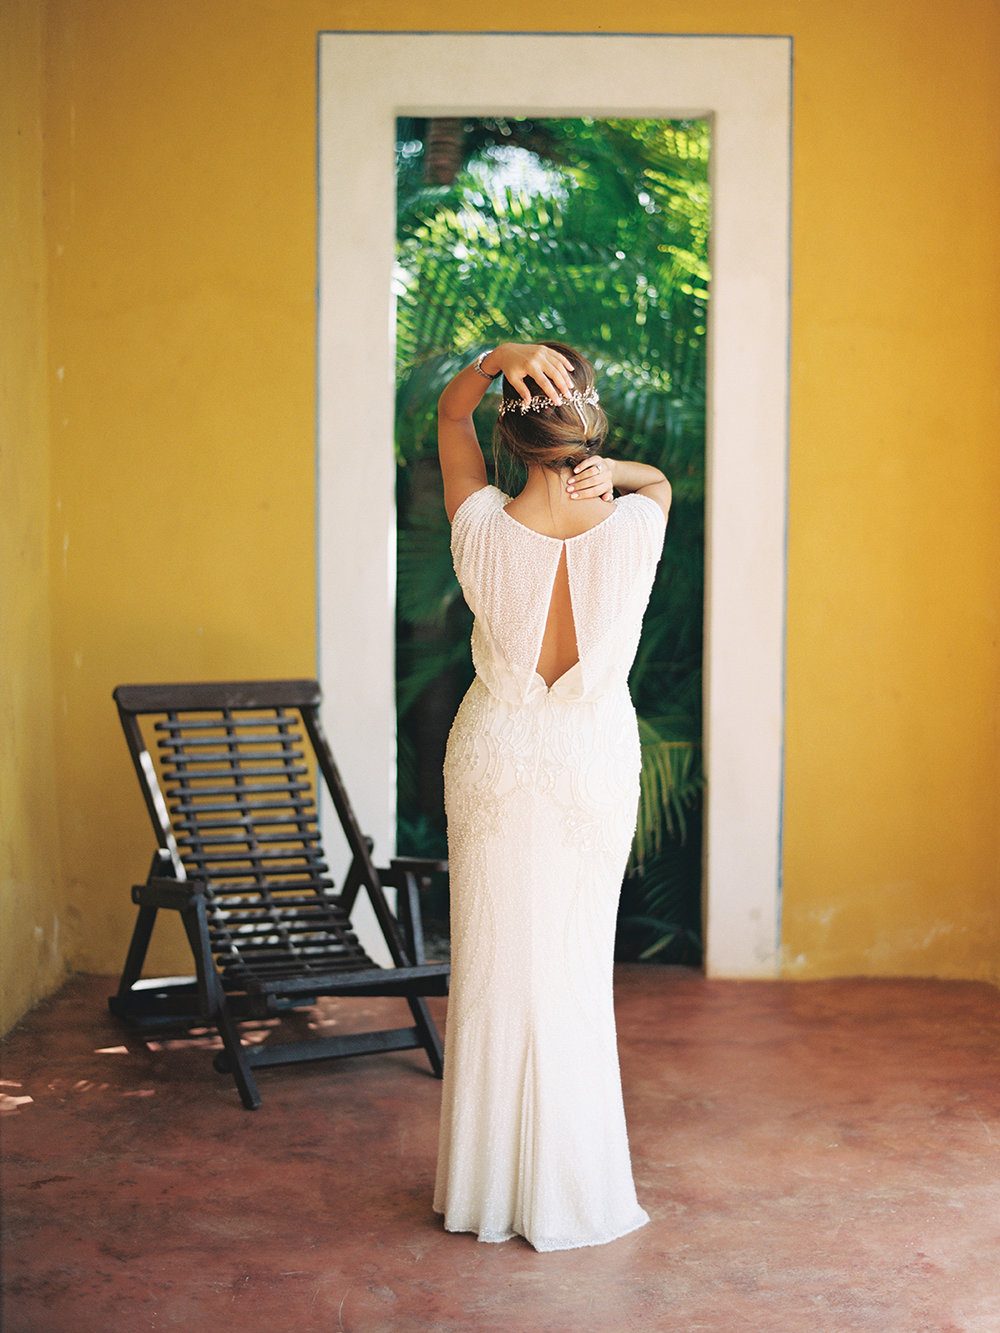 103_Dany+Sarah_Merida_Mexico_Wedding_Brumley & Wells_Fine_art_film_photography.jpg